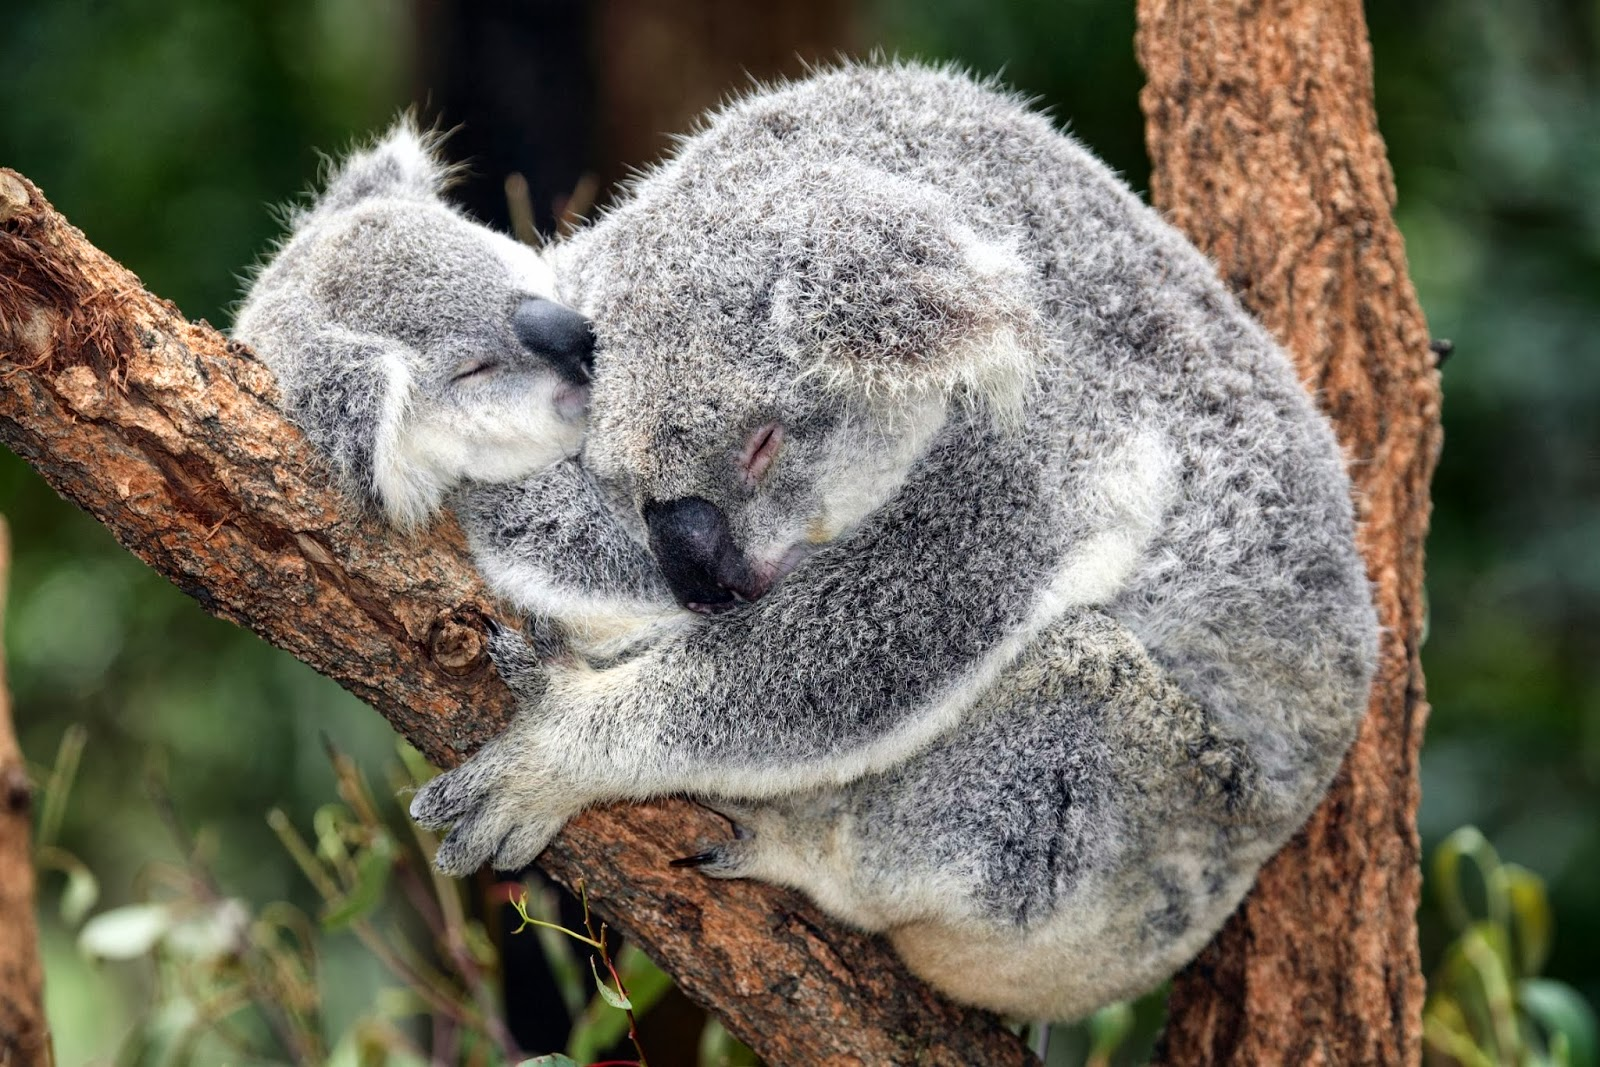 Hd Wallpapers Blog: Koalas Pictures